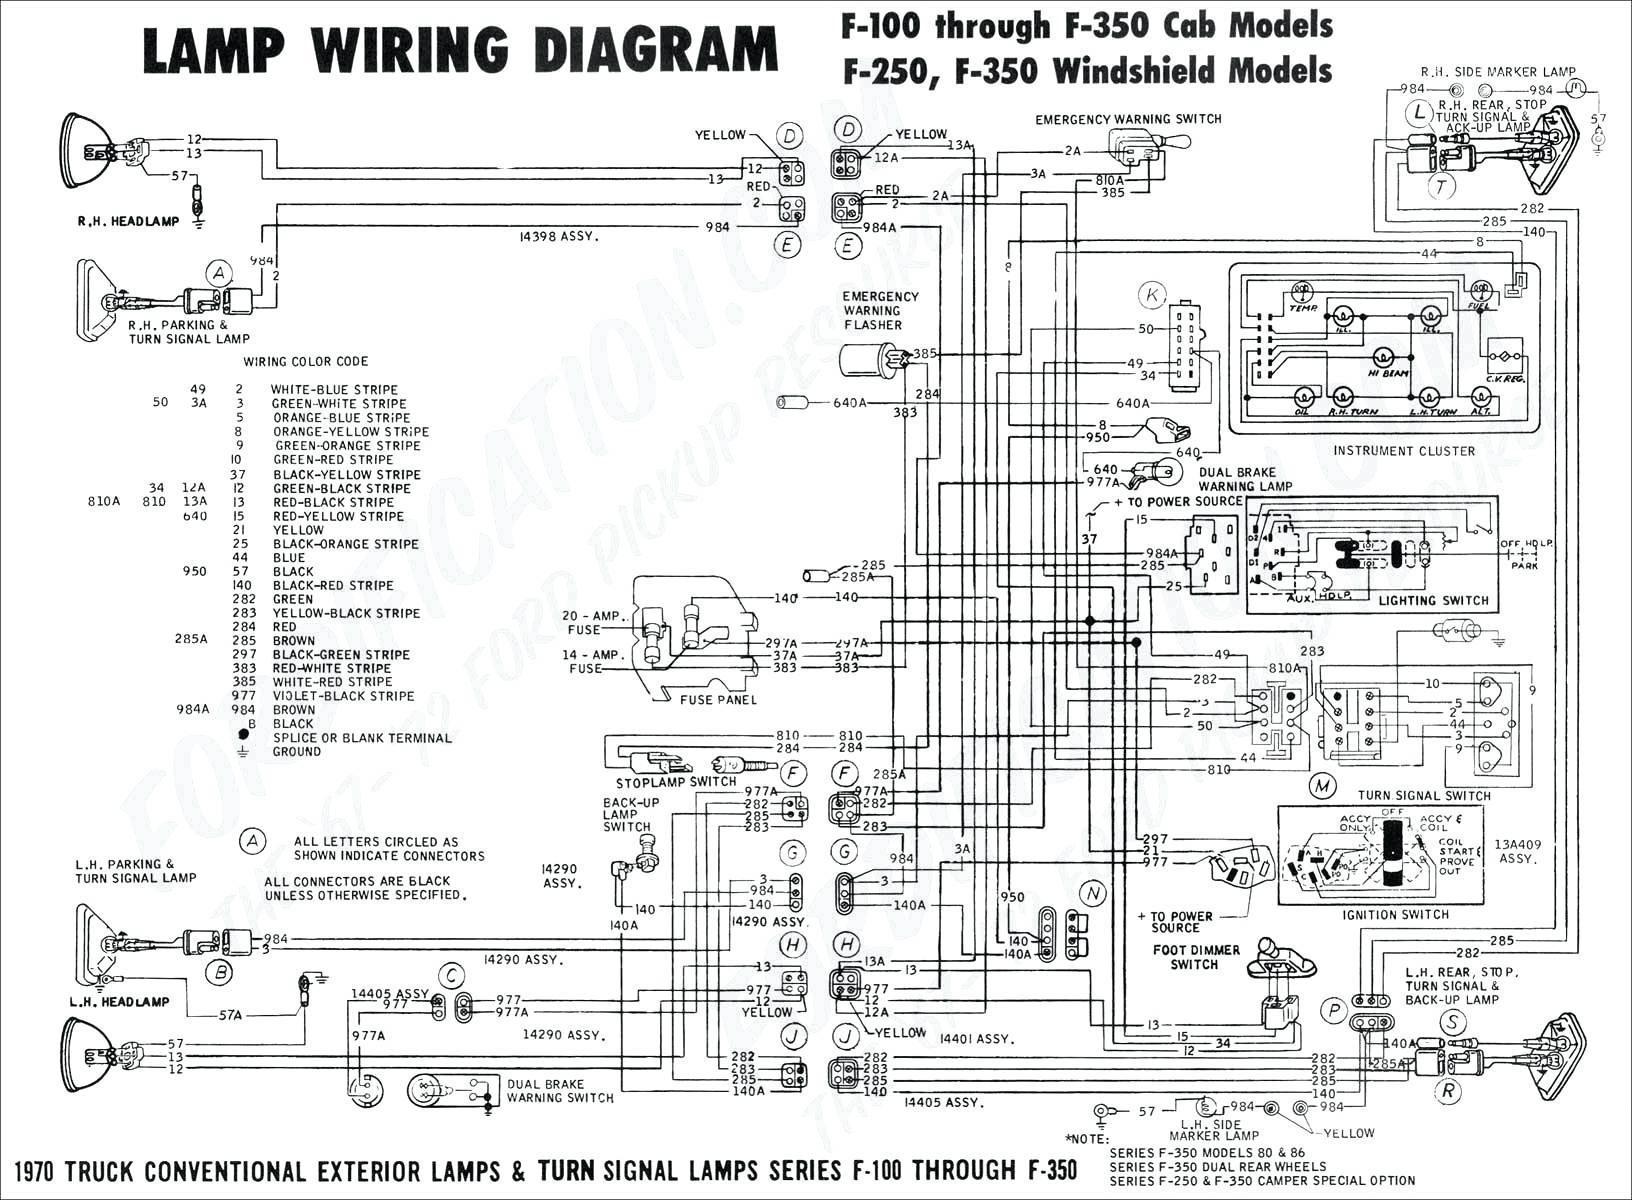 Ace Wiring Diagram | Wiring Diagram on